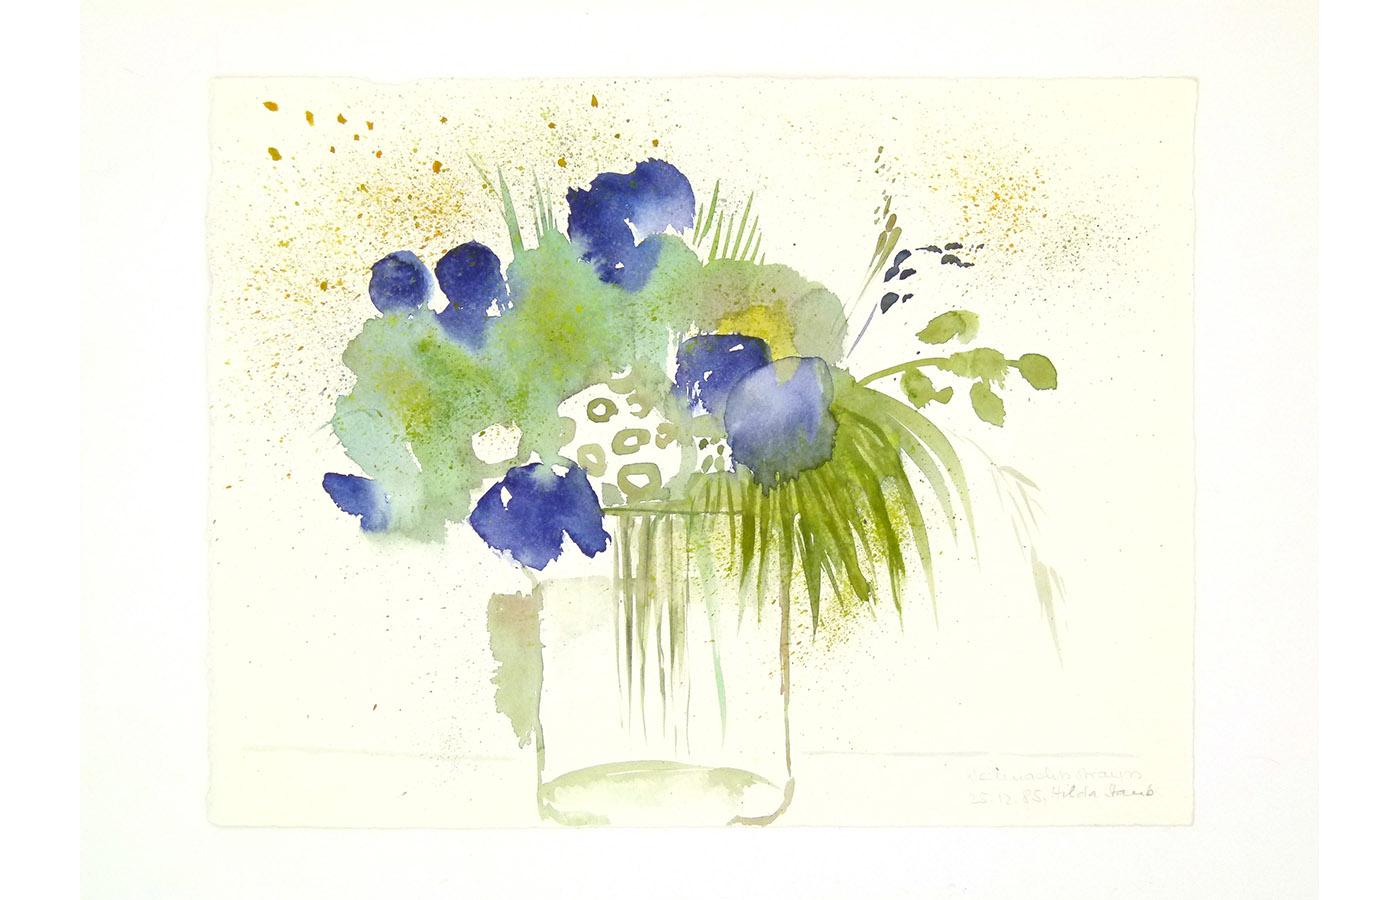 Blumen_0057_L1100367a